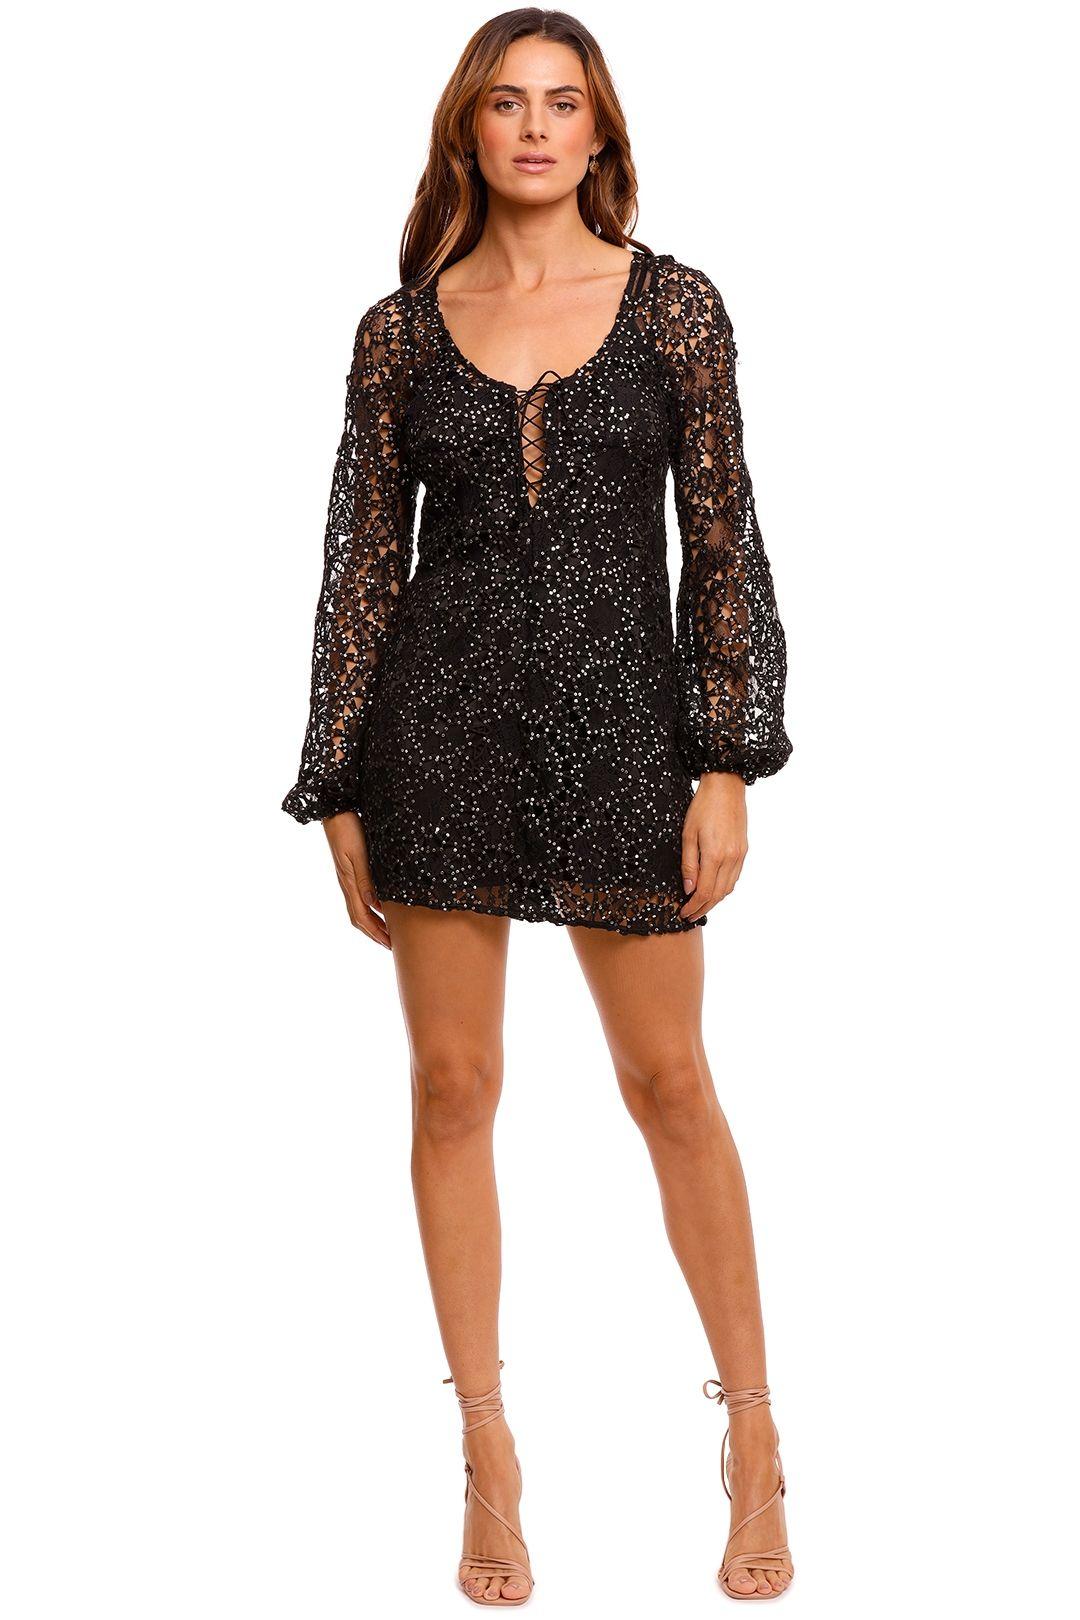 For Love and Lemons Clara Mini Dress black